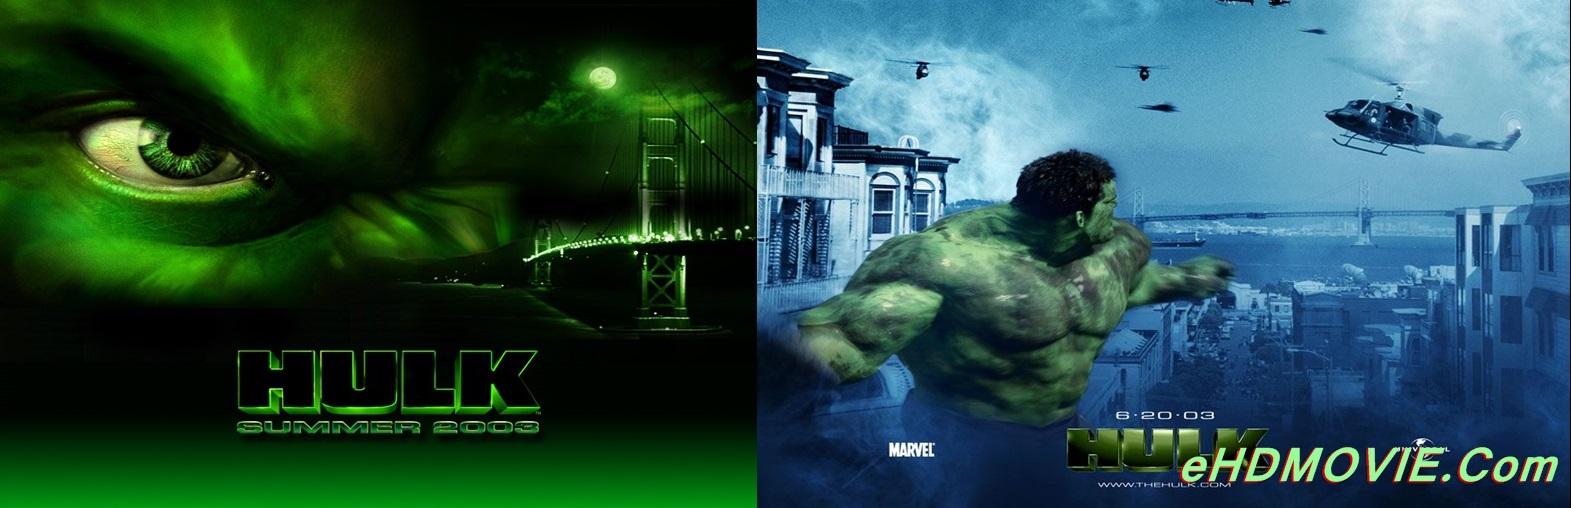 Hulk 2003 Full Movie Dual Audio [Hindi – English] 1080p - 720p - 480p ORG BRRip 400MB - 1GB - 4GB ESubs Free Download